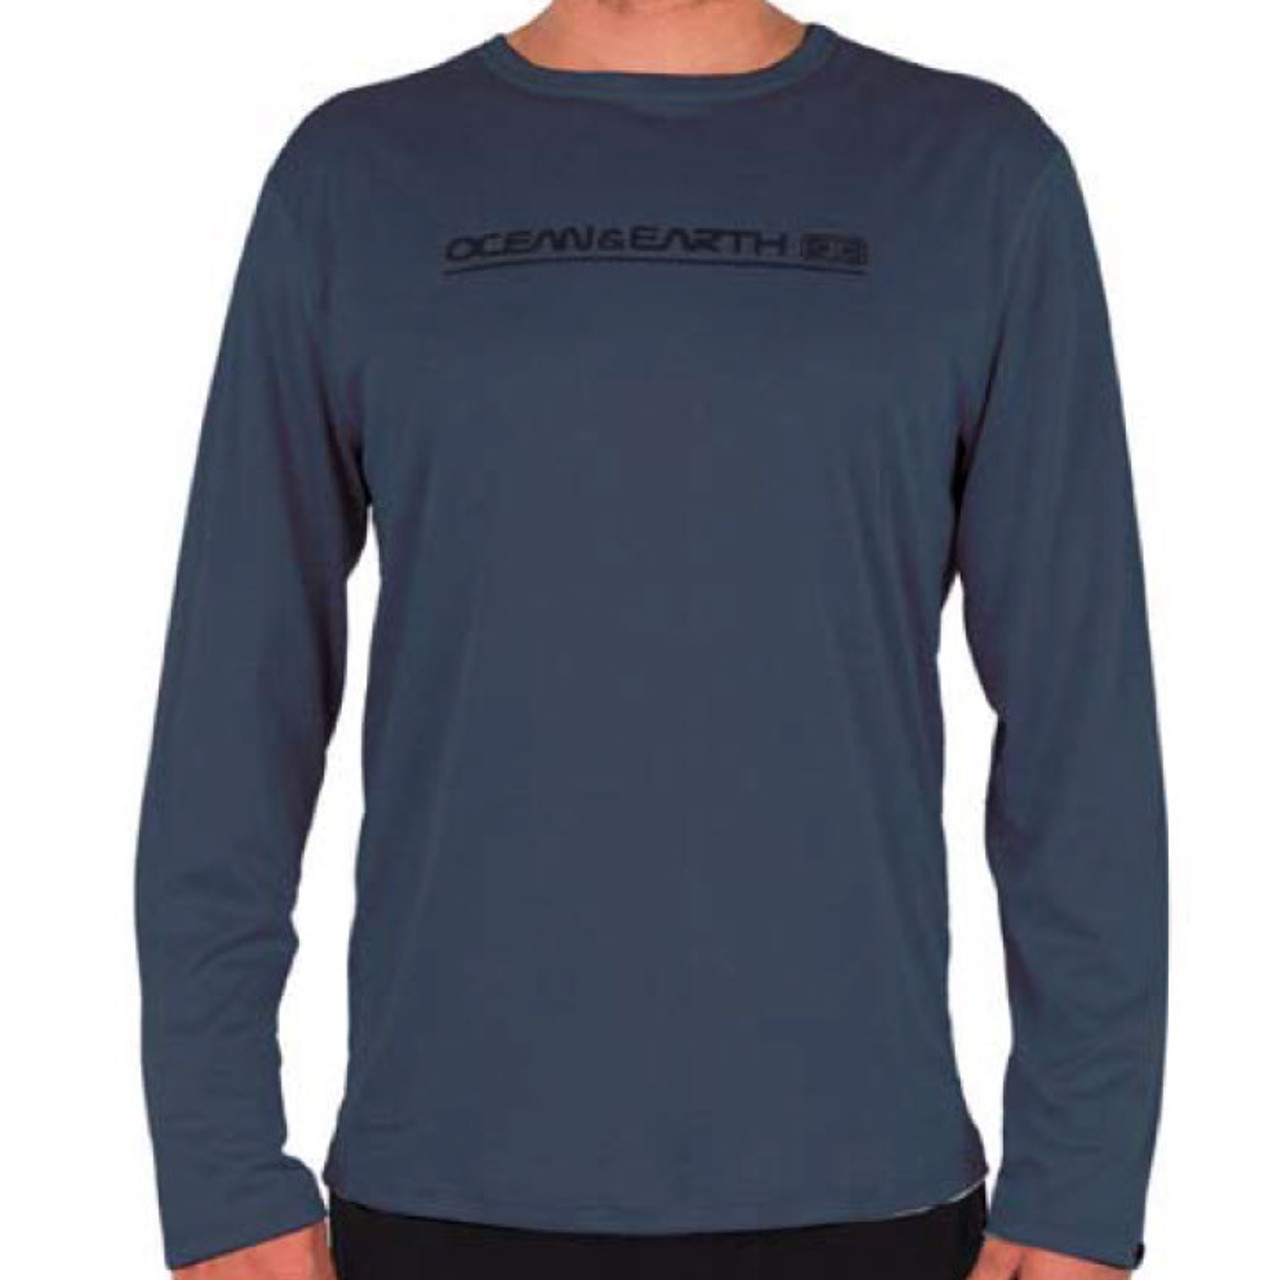 fb6705a4a471 Paddle Shirt Long Sleeve UV Top | Navy | Sun Protection | Relax Fit Beach  Shirt | Ocean and Earth - Surf Shops Australia